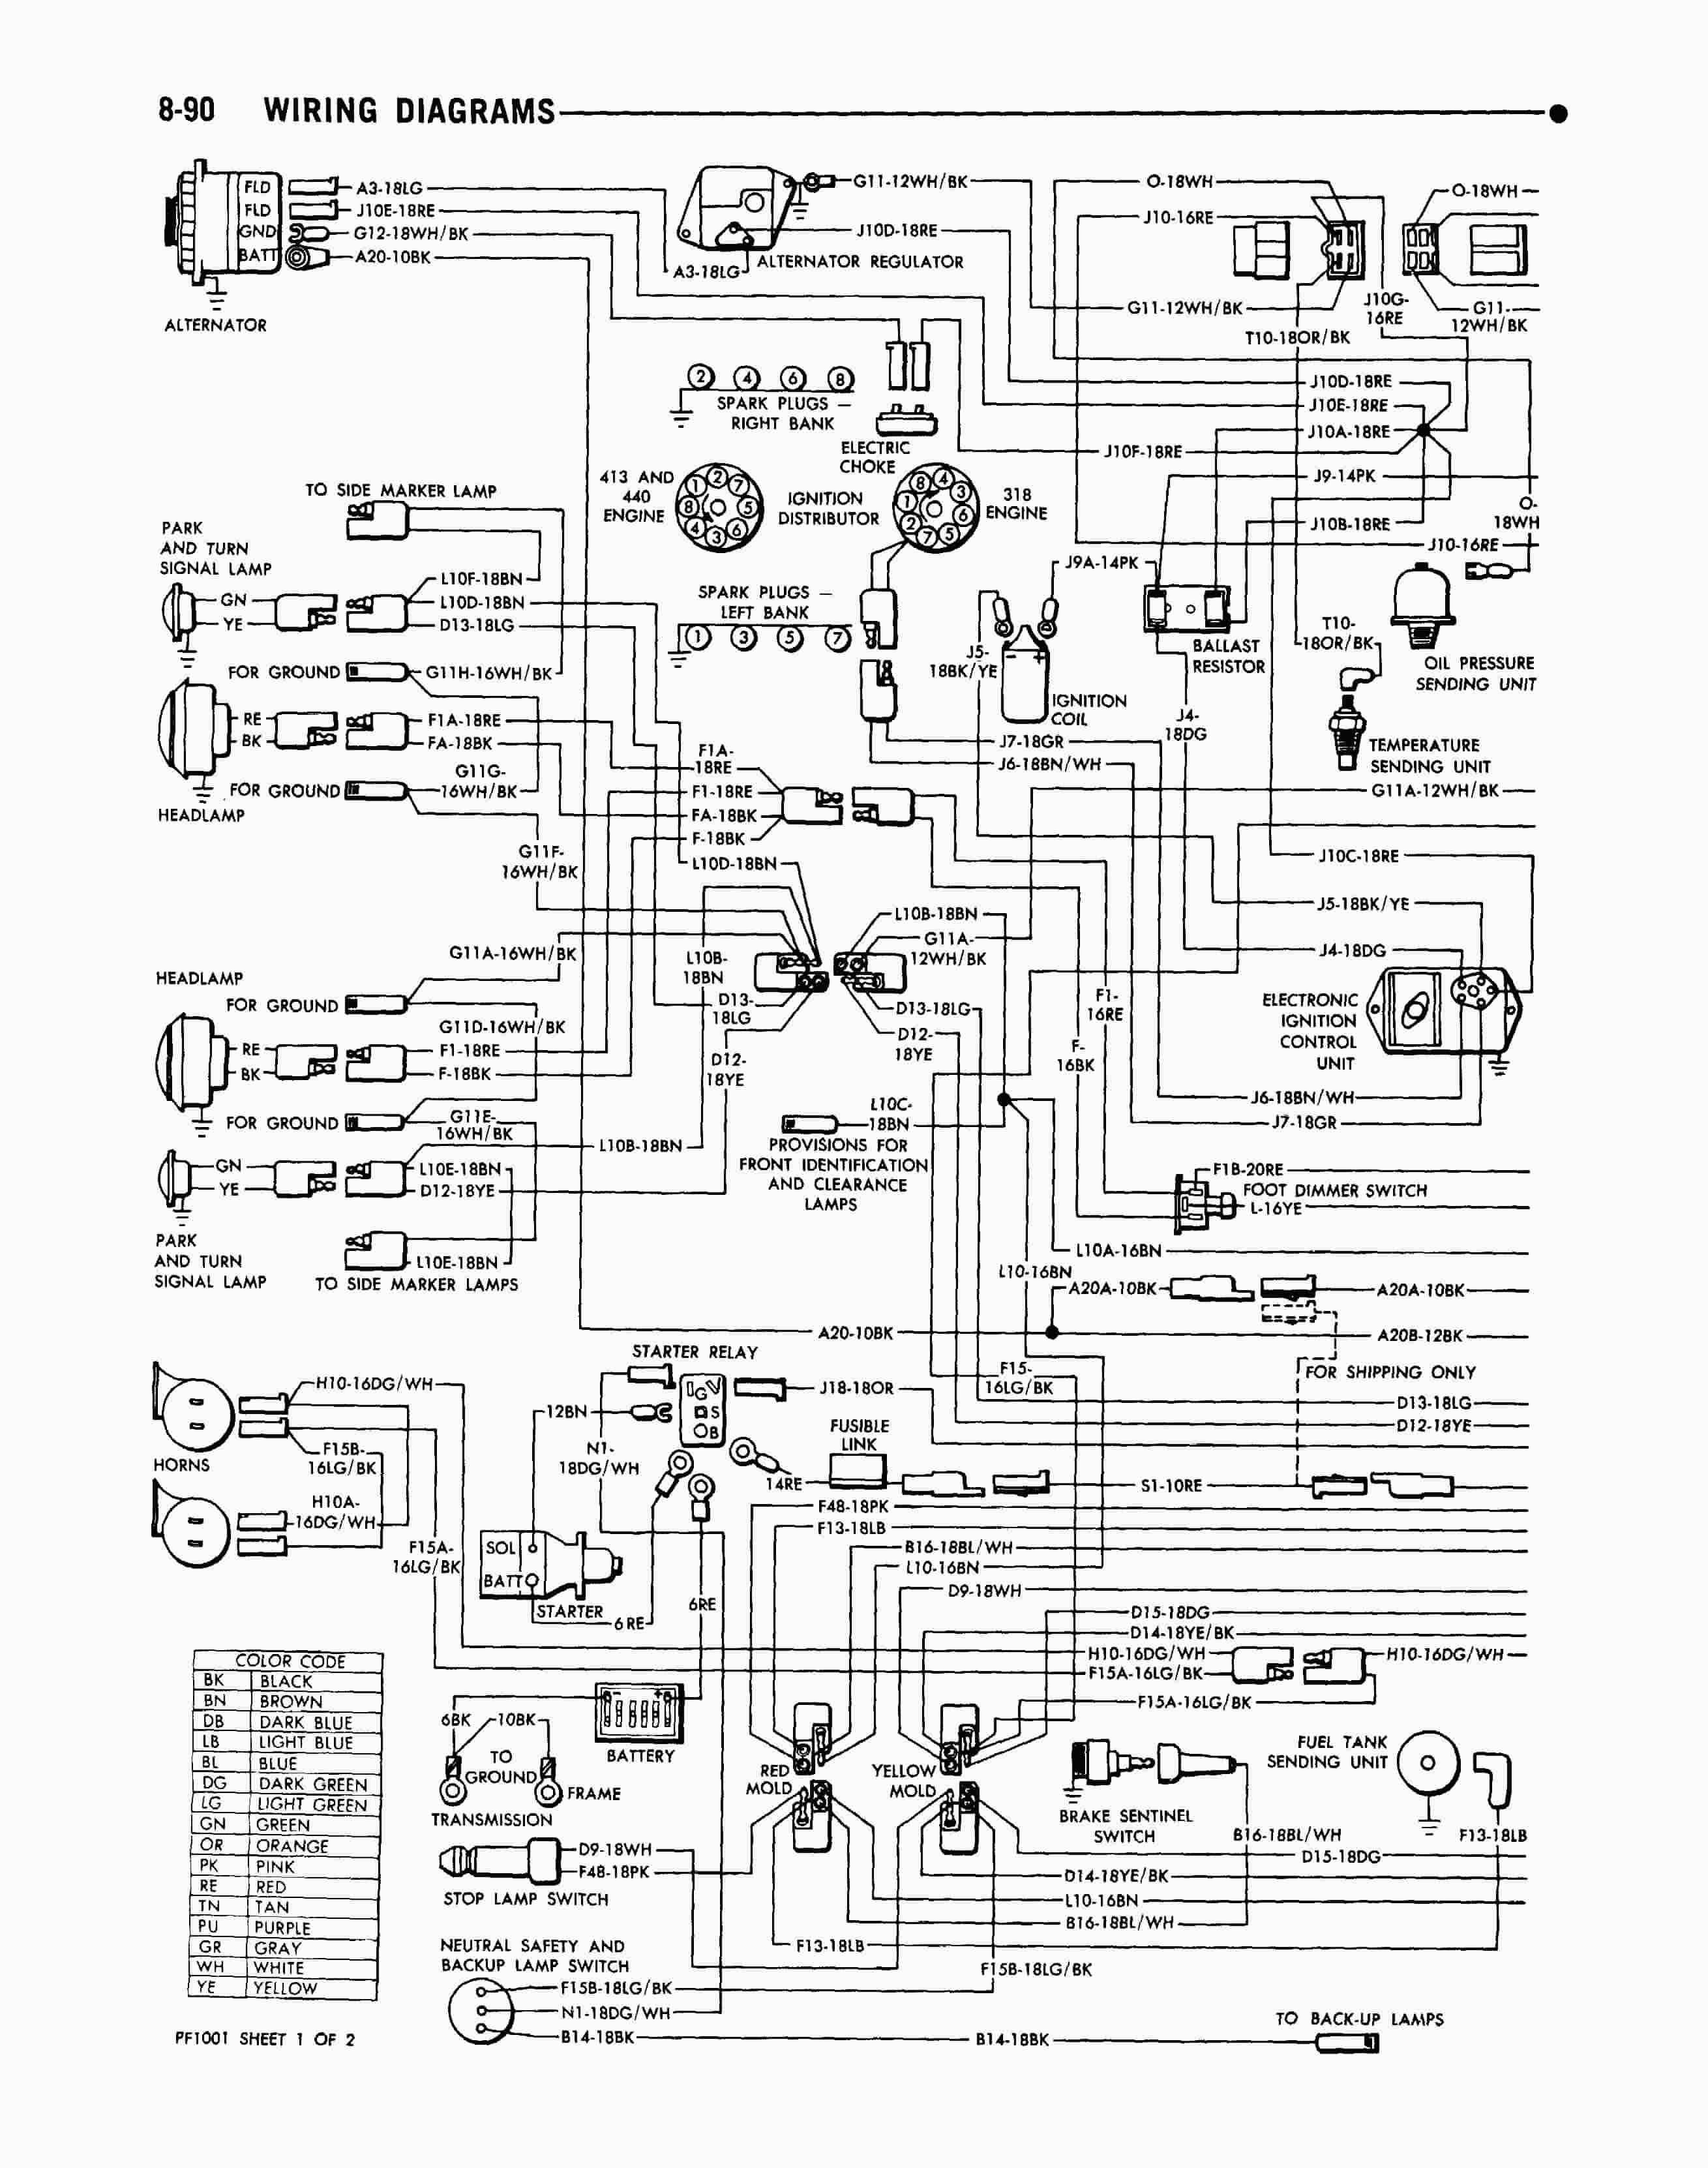 Cougar Rv Wiring Diagrams - Wiring Diagram Data Oreo - Keystone Trailer Wiring Diagram